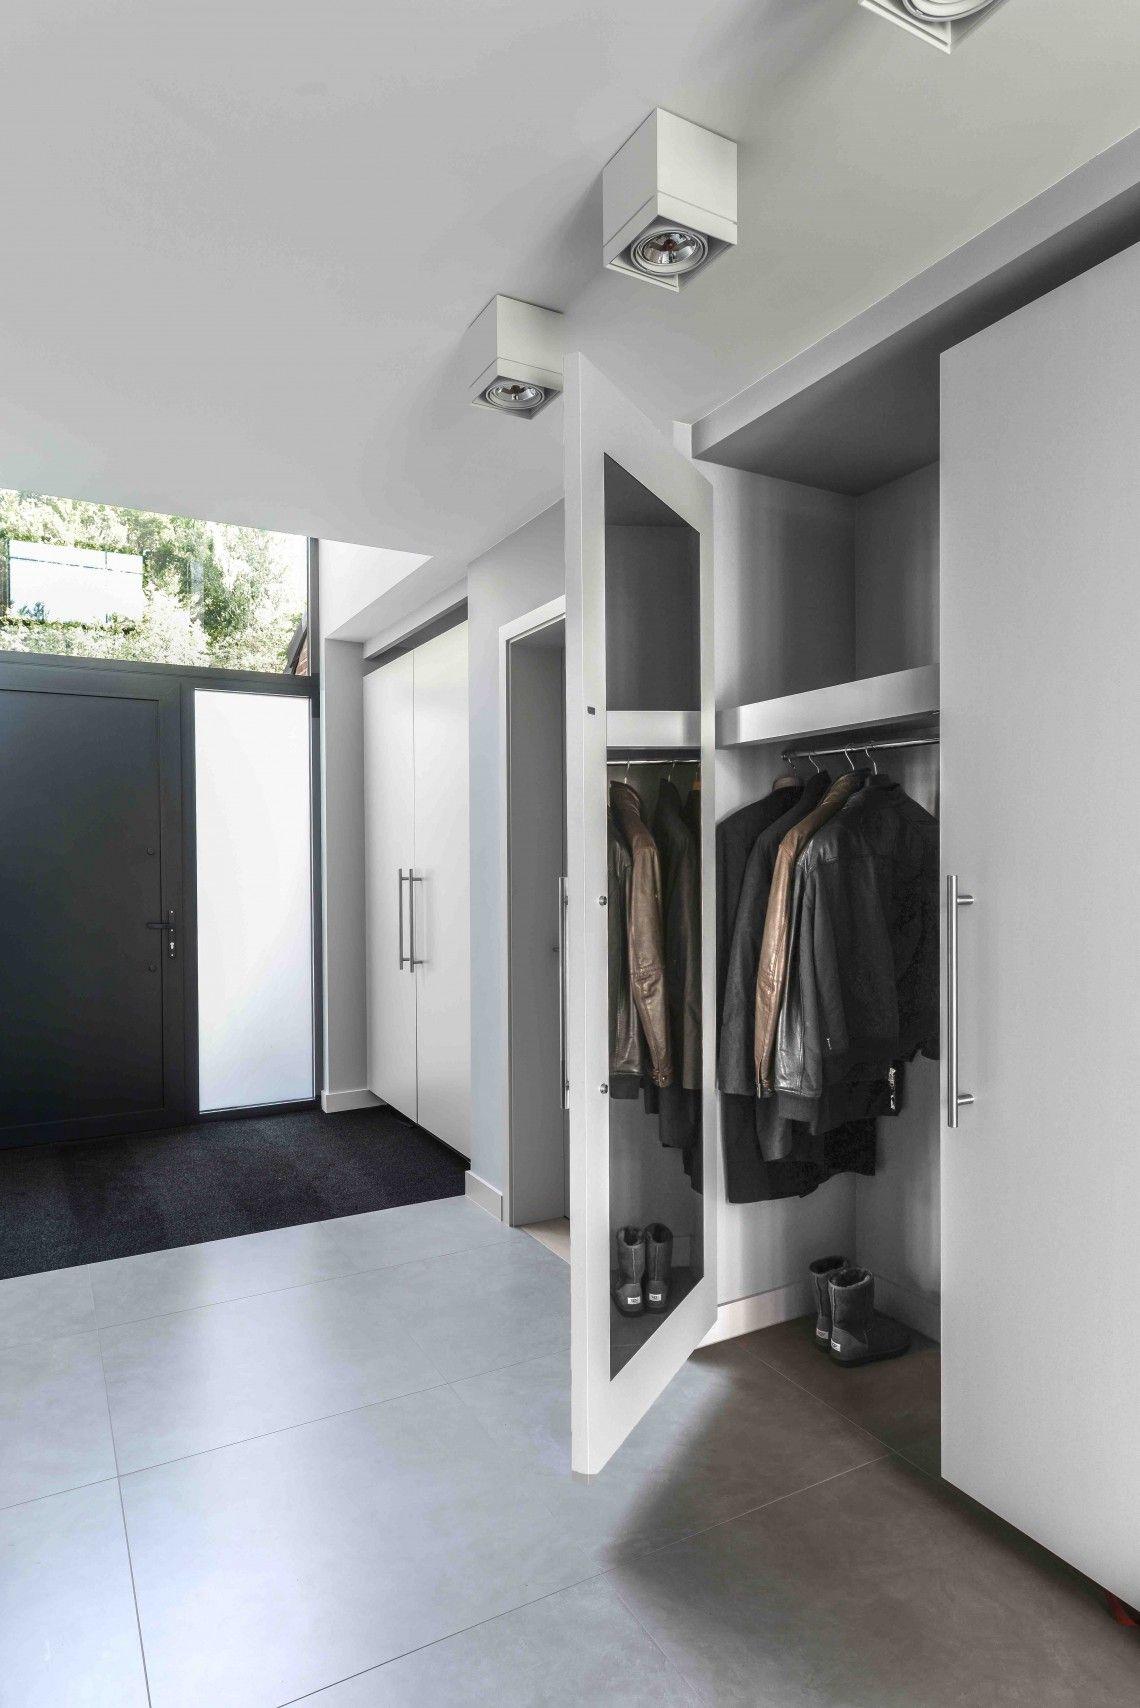 Hallway storage furniture  E closet handles hardware  Drömhus  Pinterest  Hardware Hall